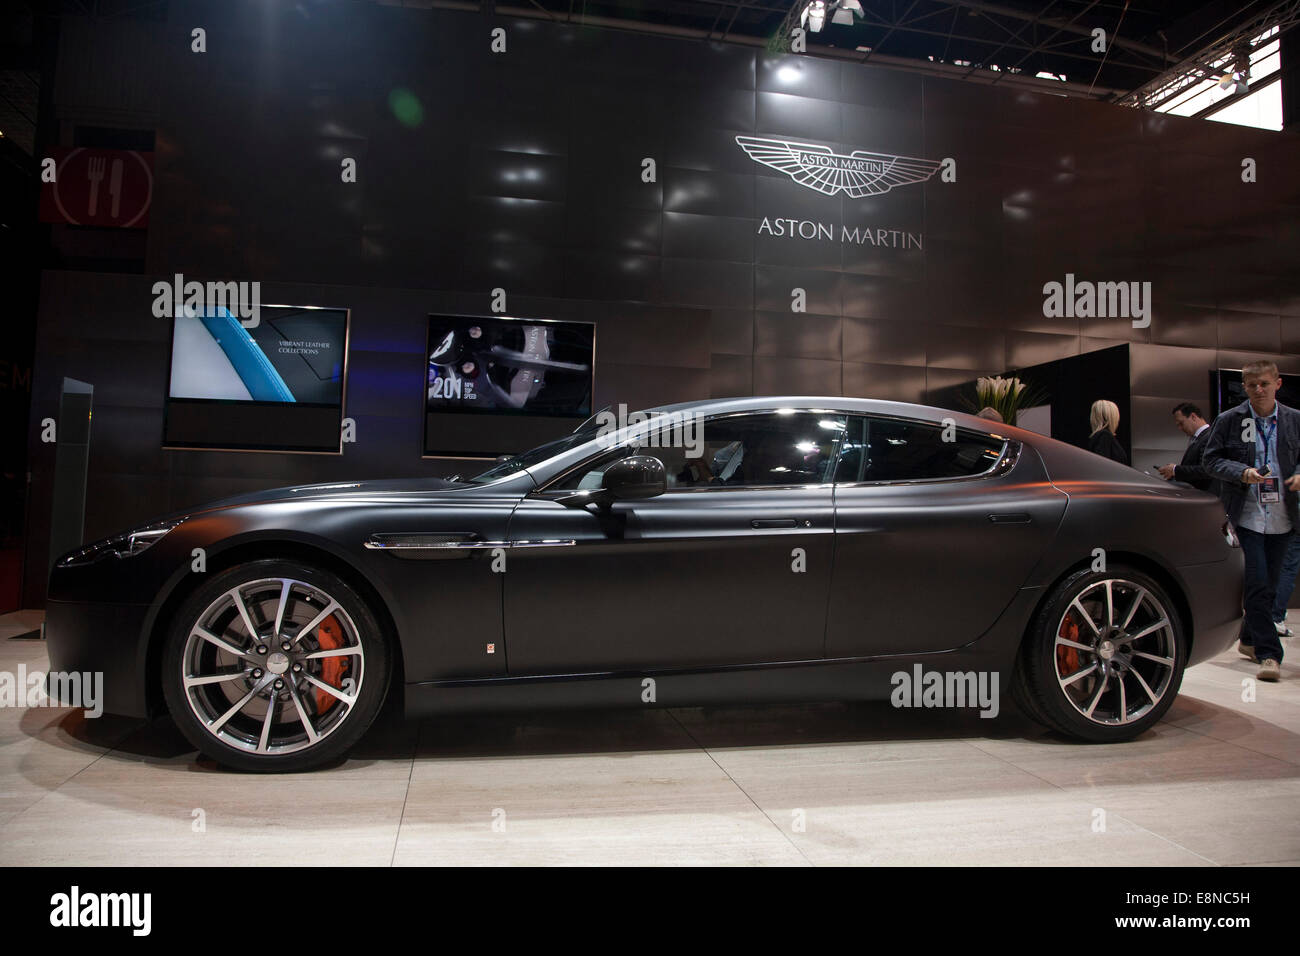 Aston Martin Rapide S Paris Motor Show Mondial de l ' Automobile 2014 Stockbild